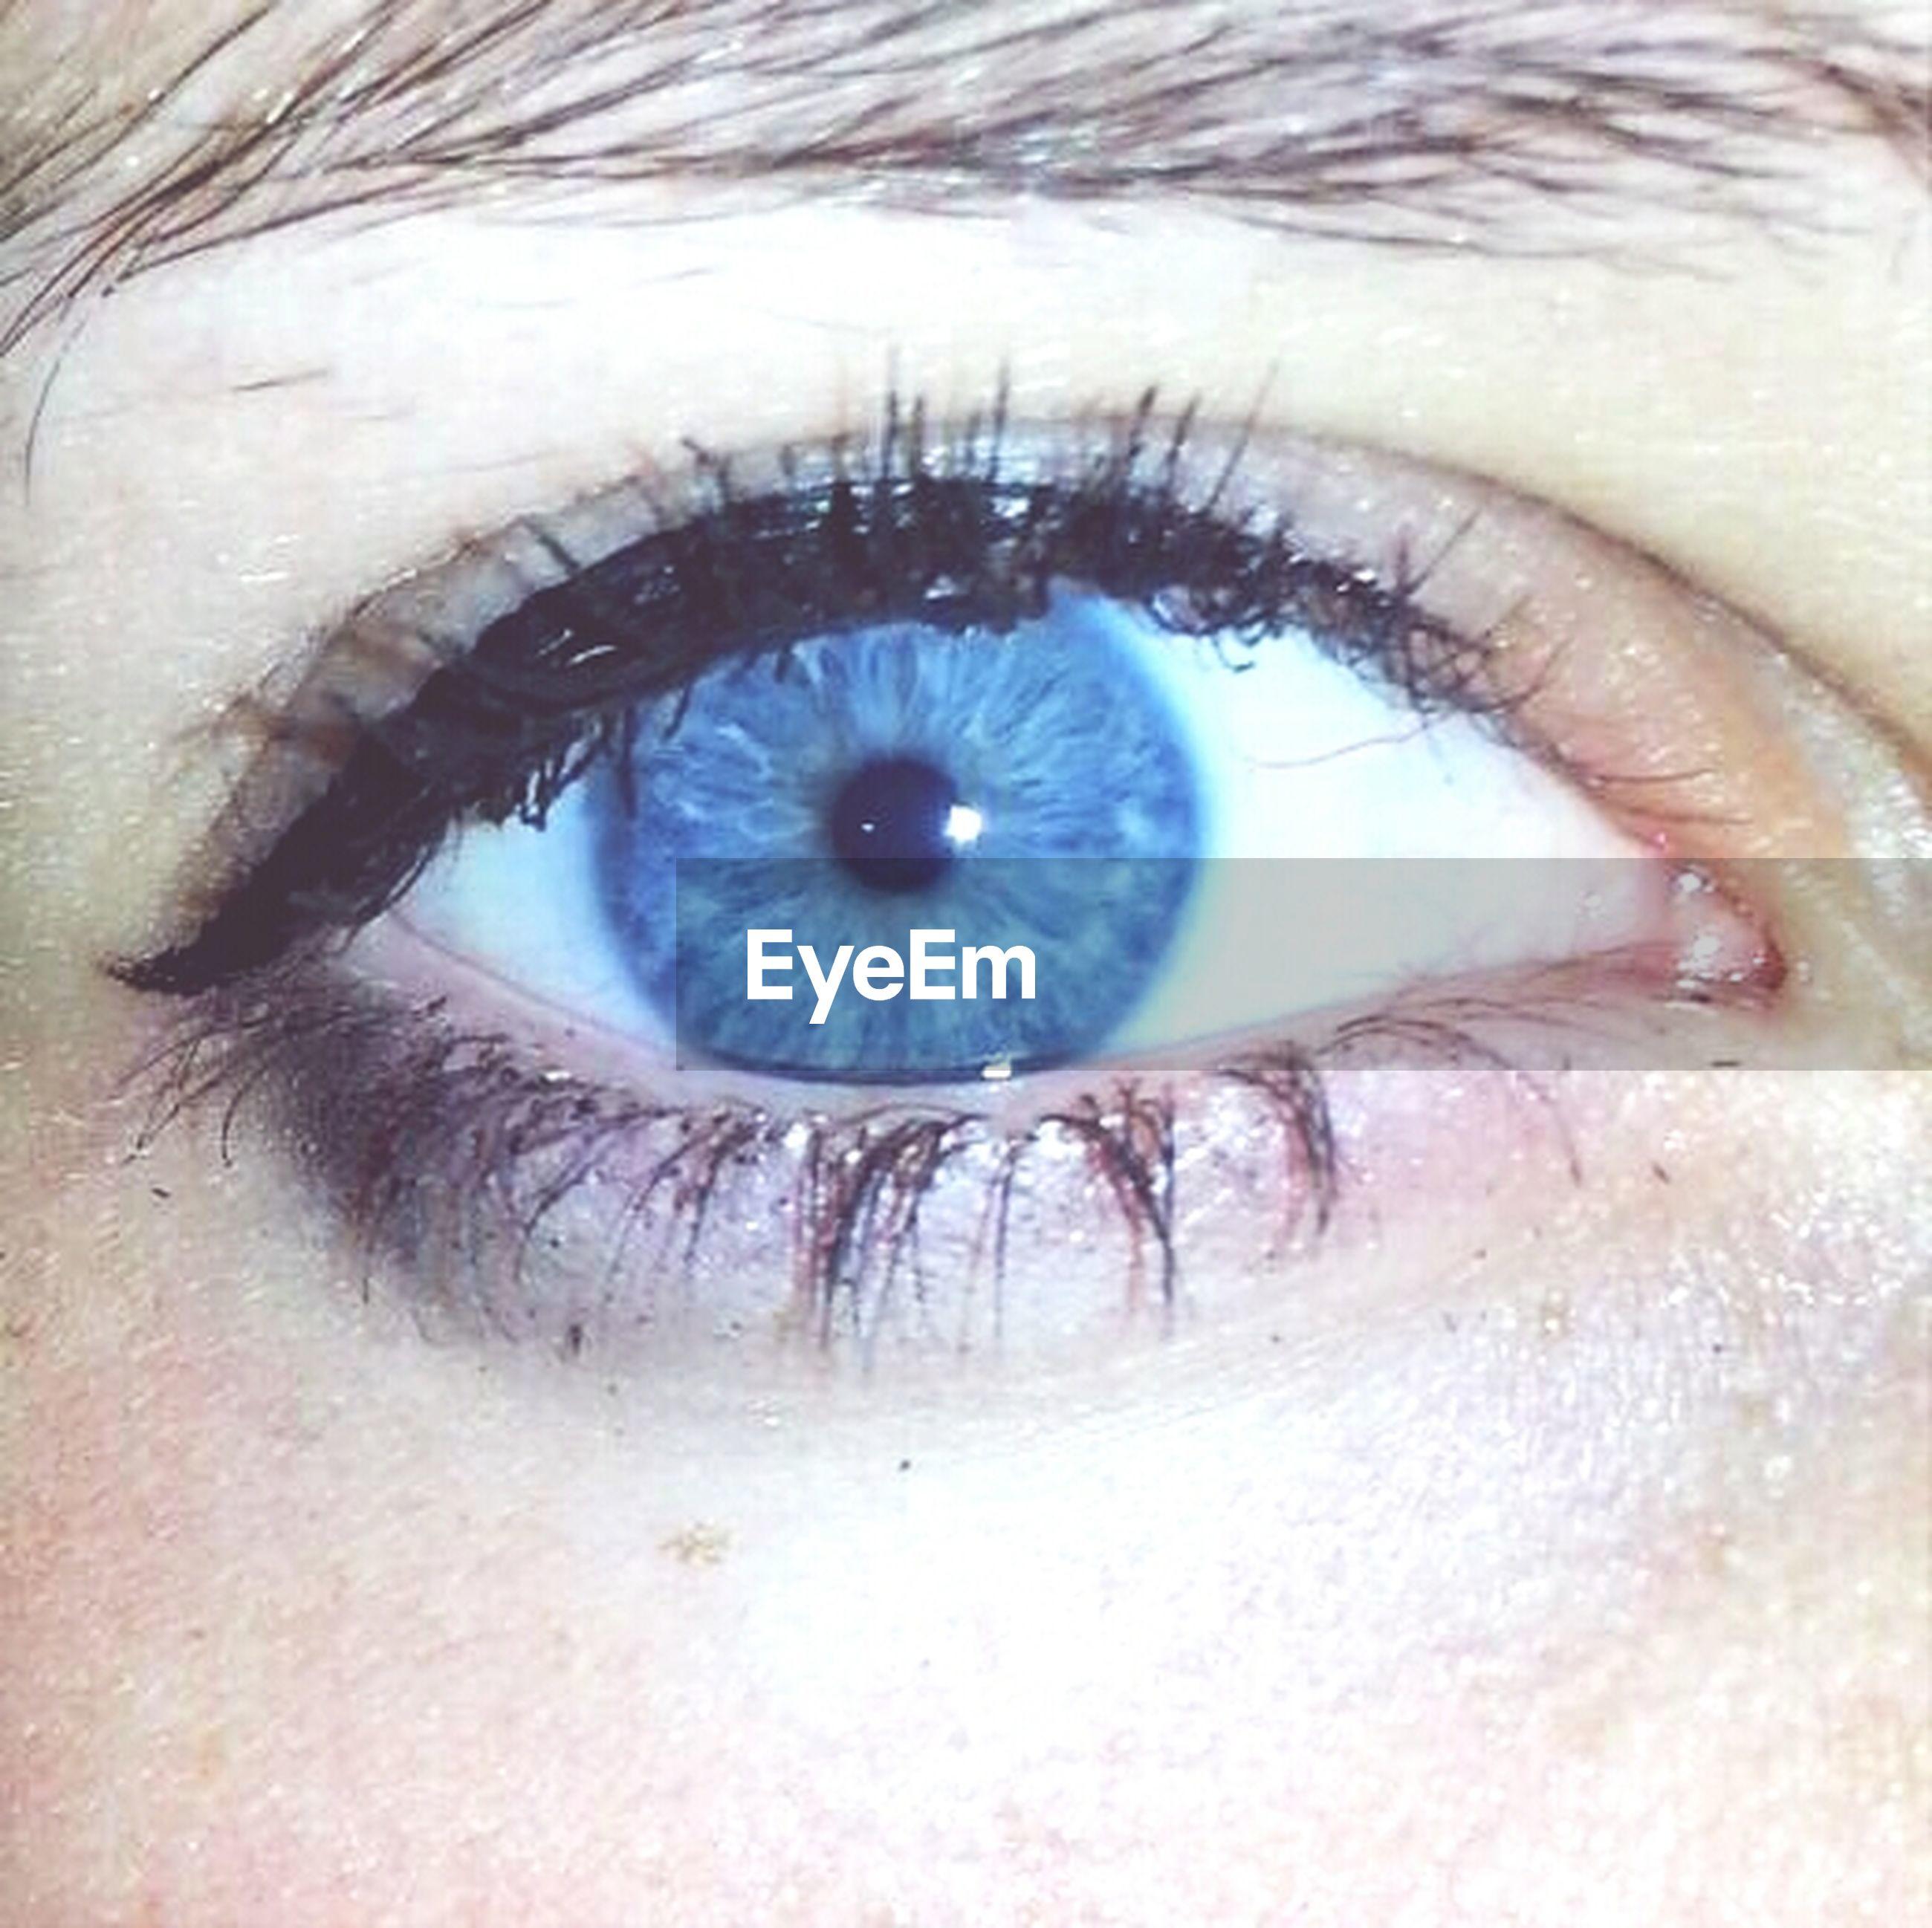 human eye, eyesight, eyelash, close-up, sensory perception, part of, iris - eye, eyeball, extreme close-up, human skin, extreme close up, full frame, unrecognizable person, looking at camera, portrait, circle, vision